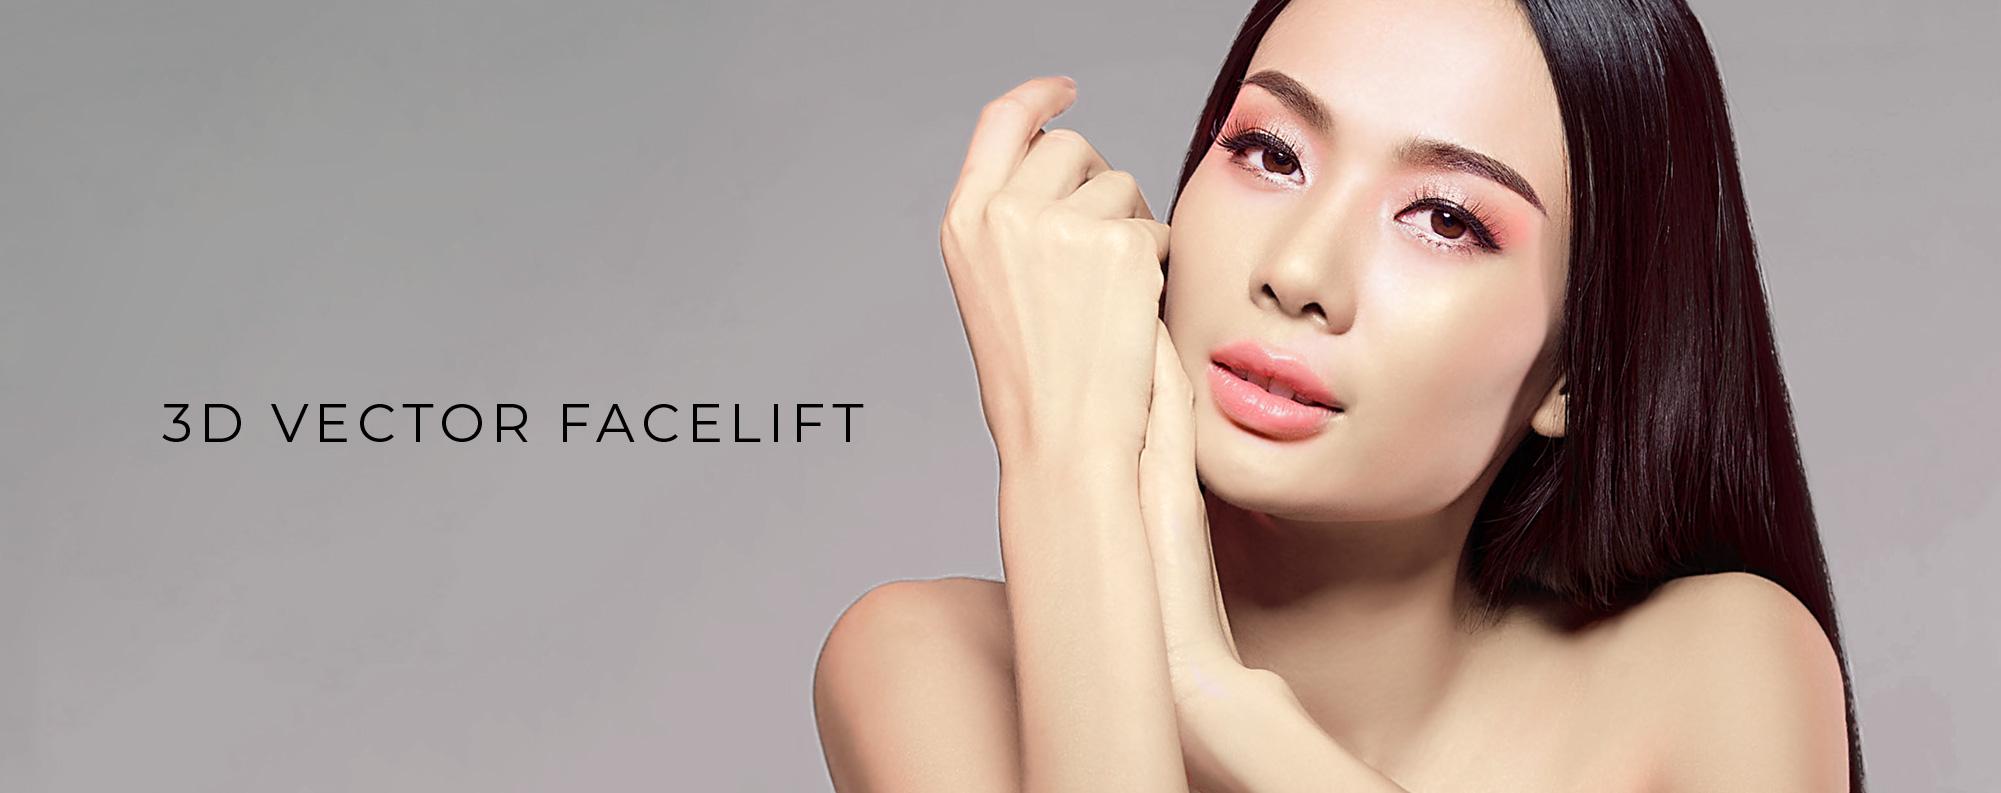 Facelift Singapore